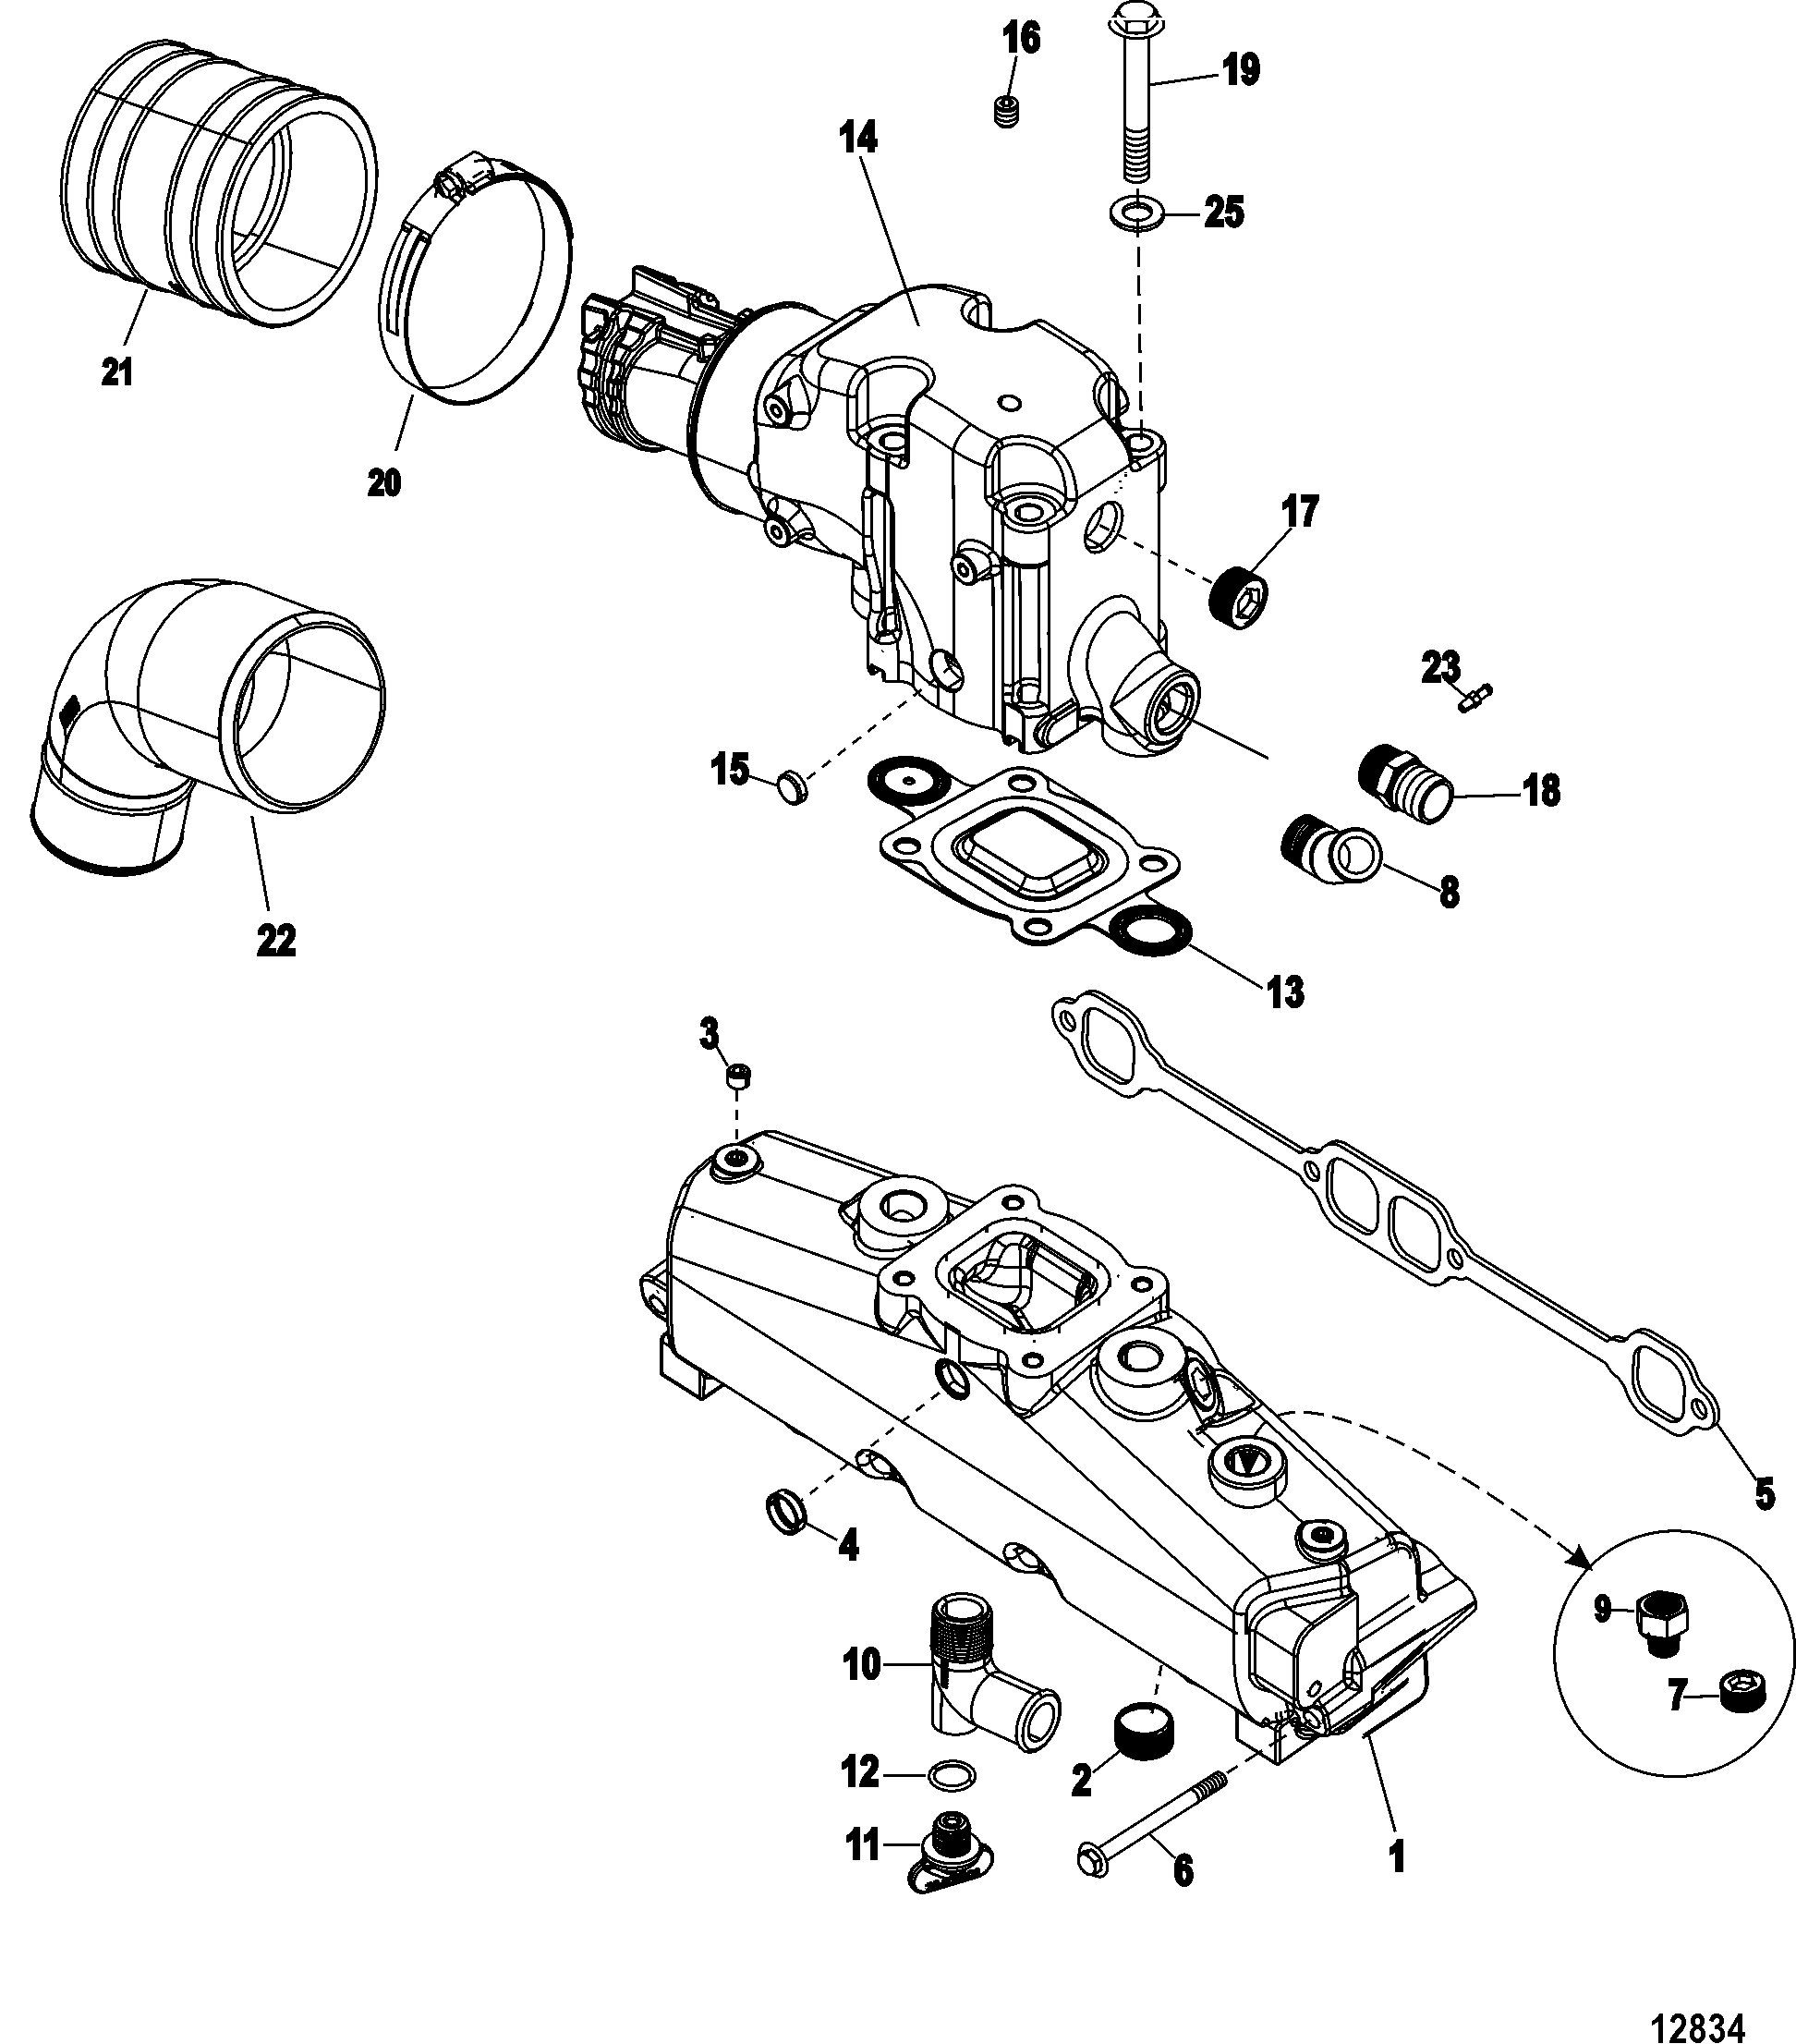 ford 302 marine engine diagram